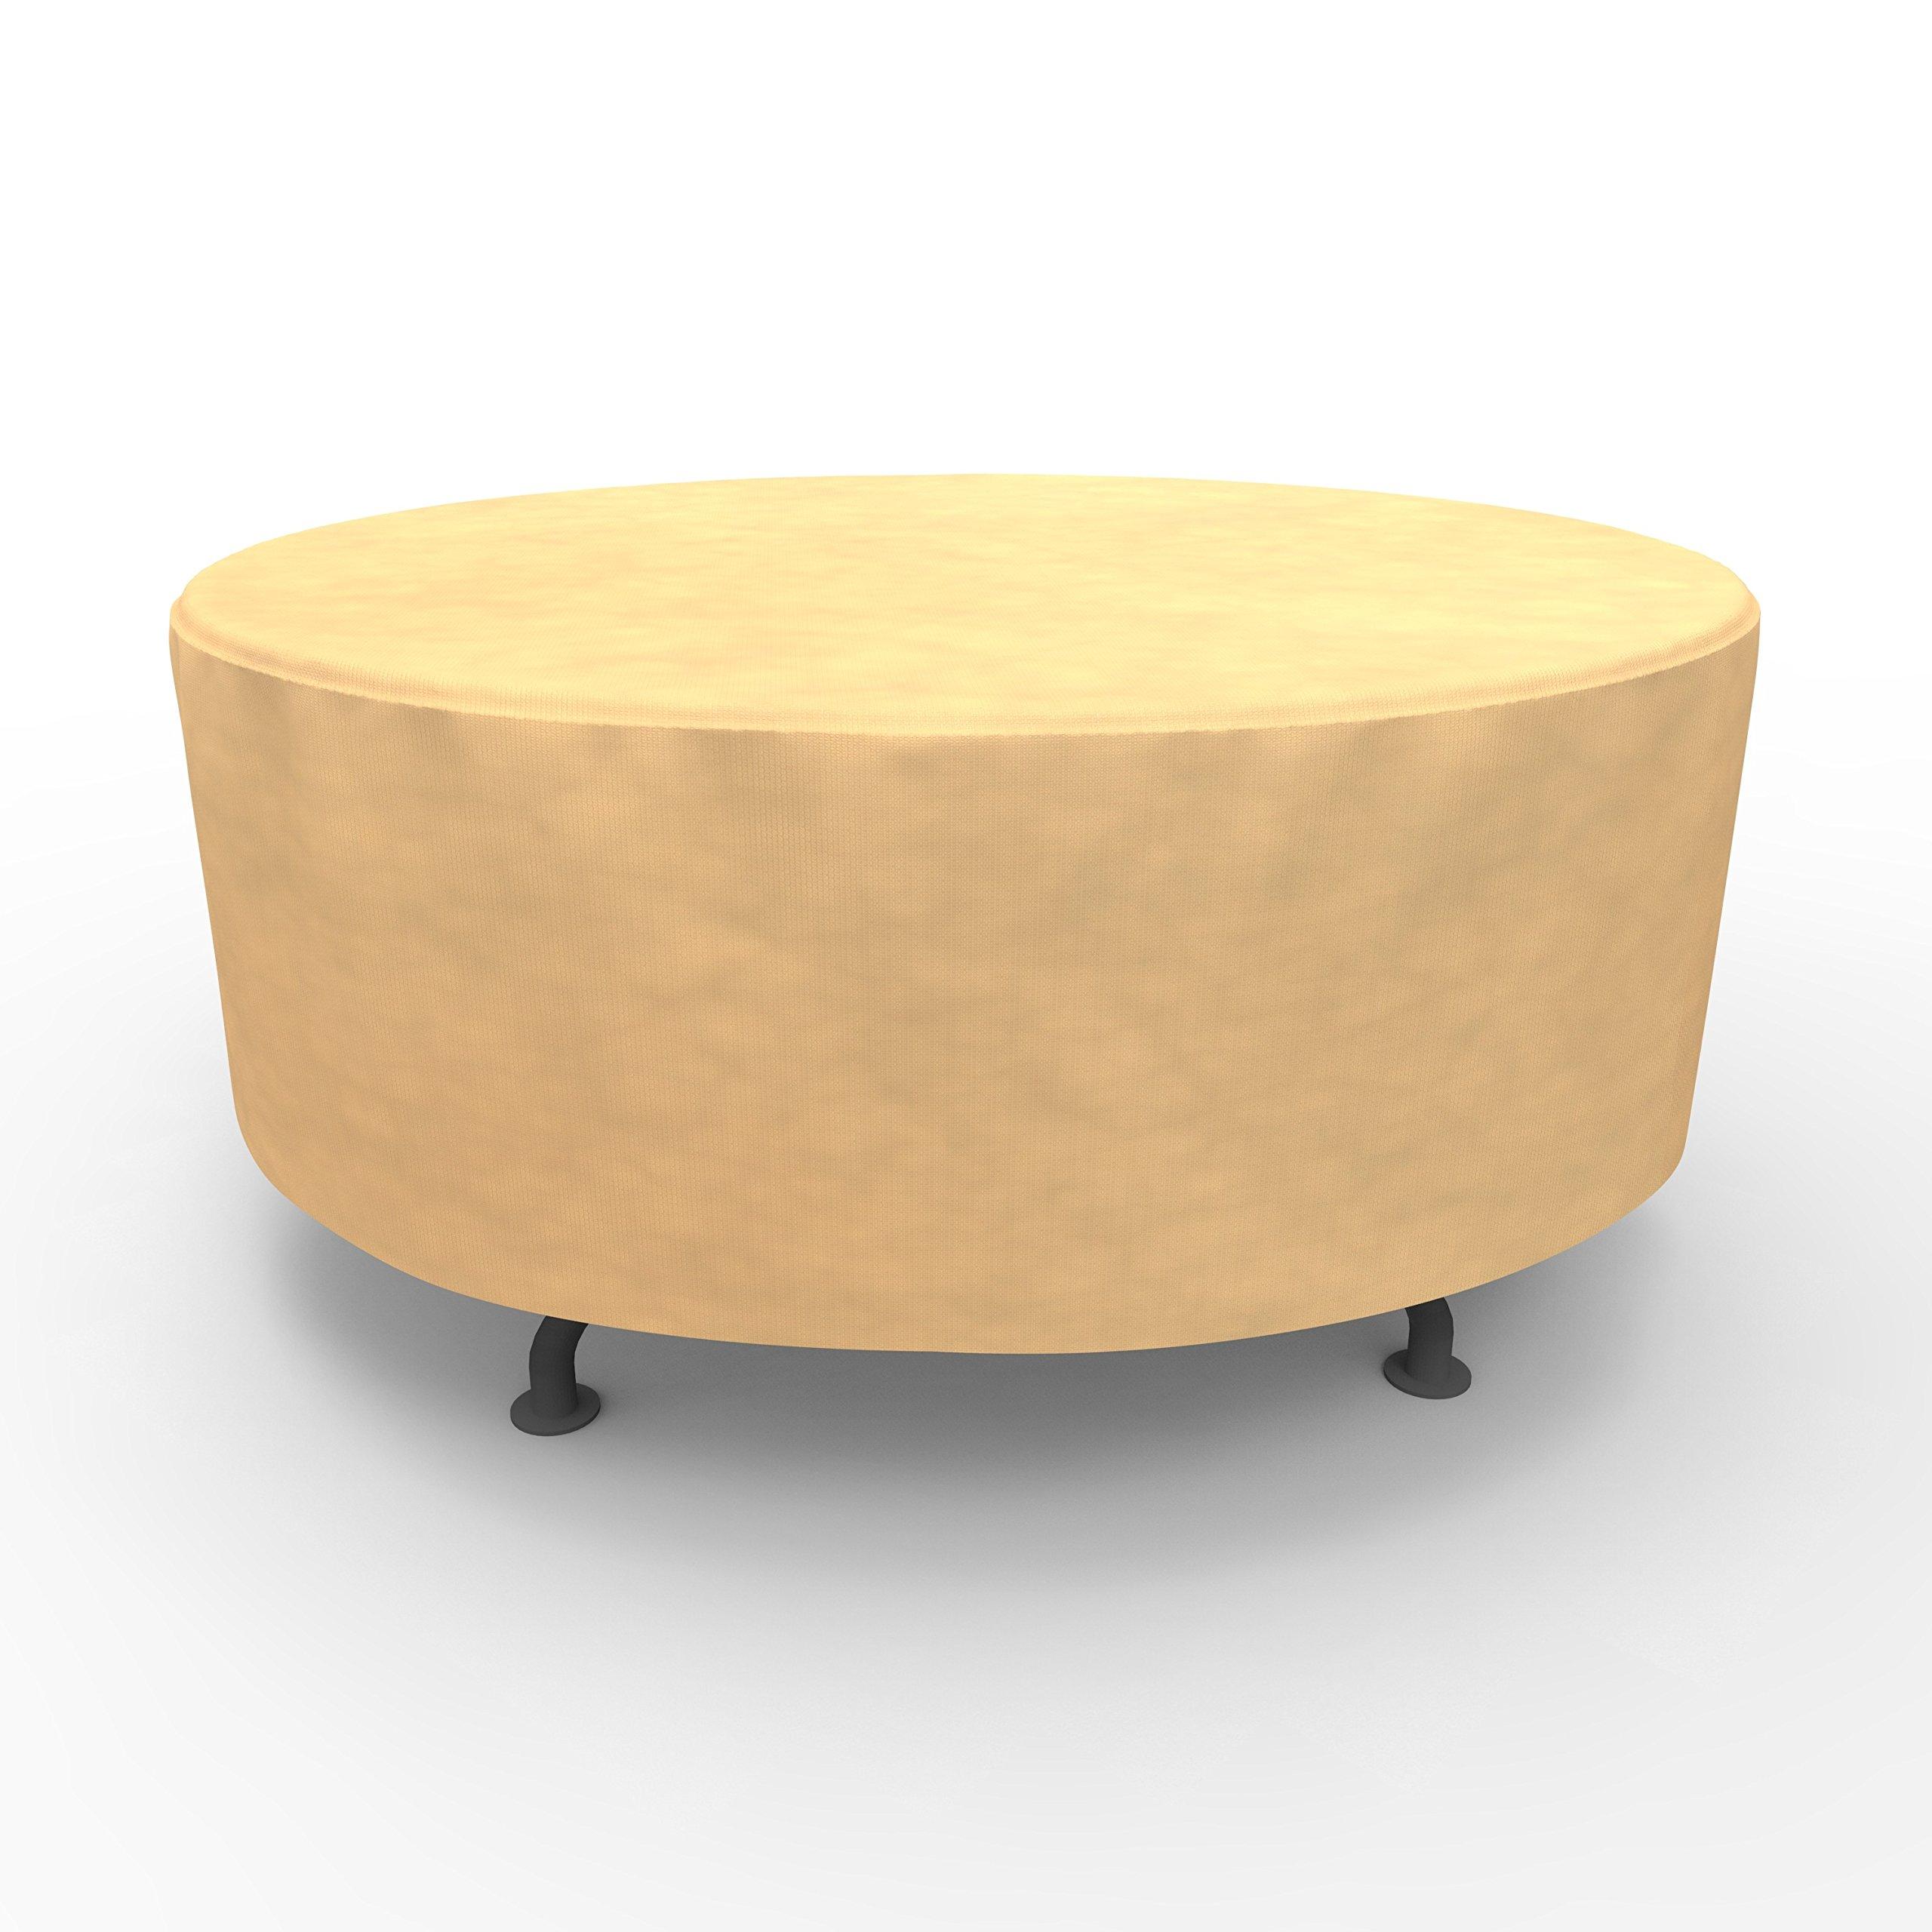 EmpirePatio Round Table Covers 60 in Diameter - Nutmeg